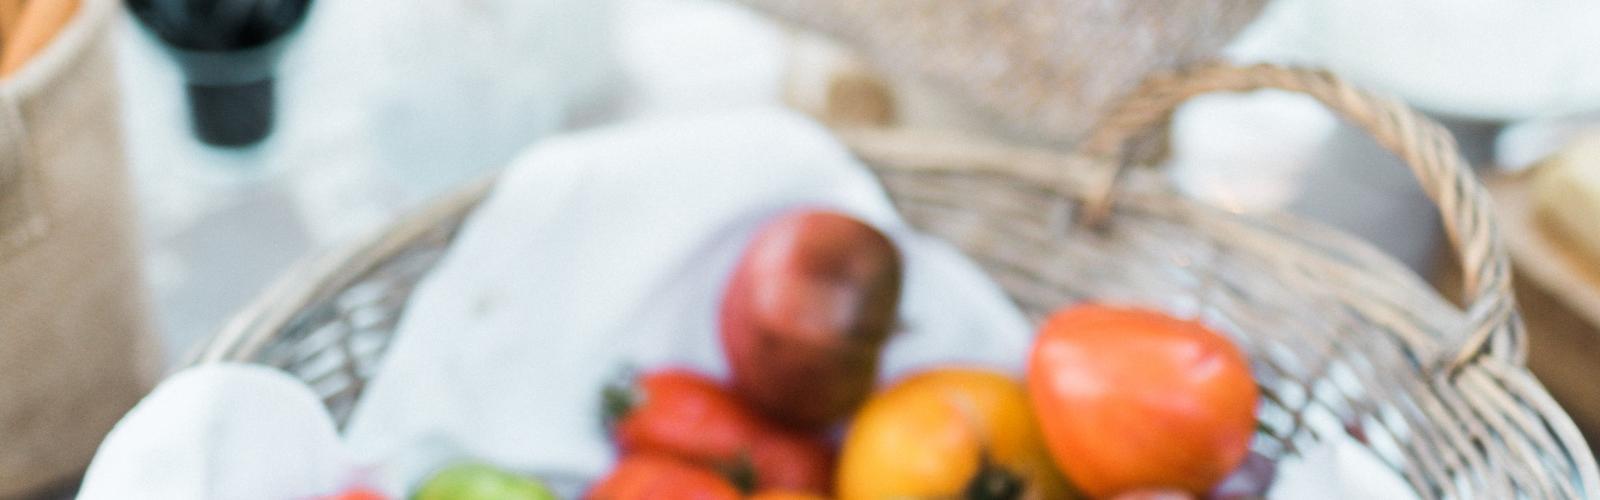 Nos plateaux repas : suggestions de break gustatifs